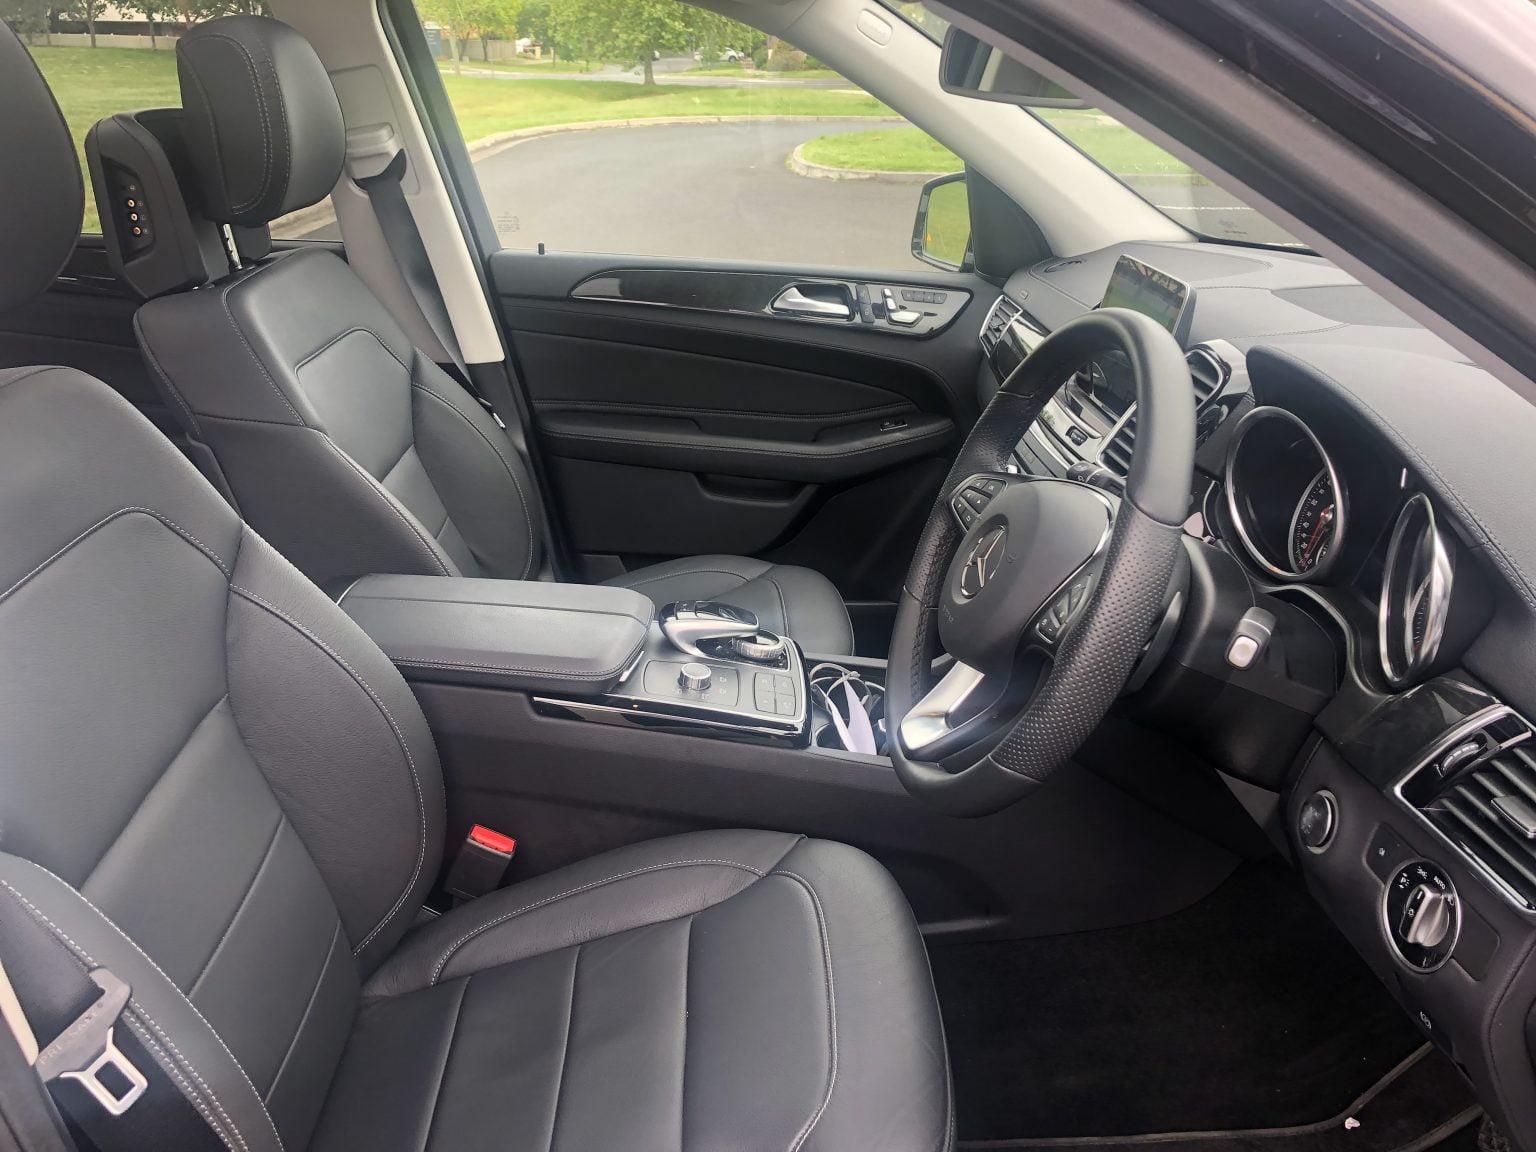 Mercedes luxury SUV